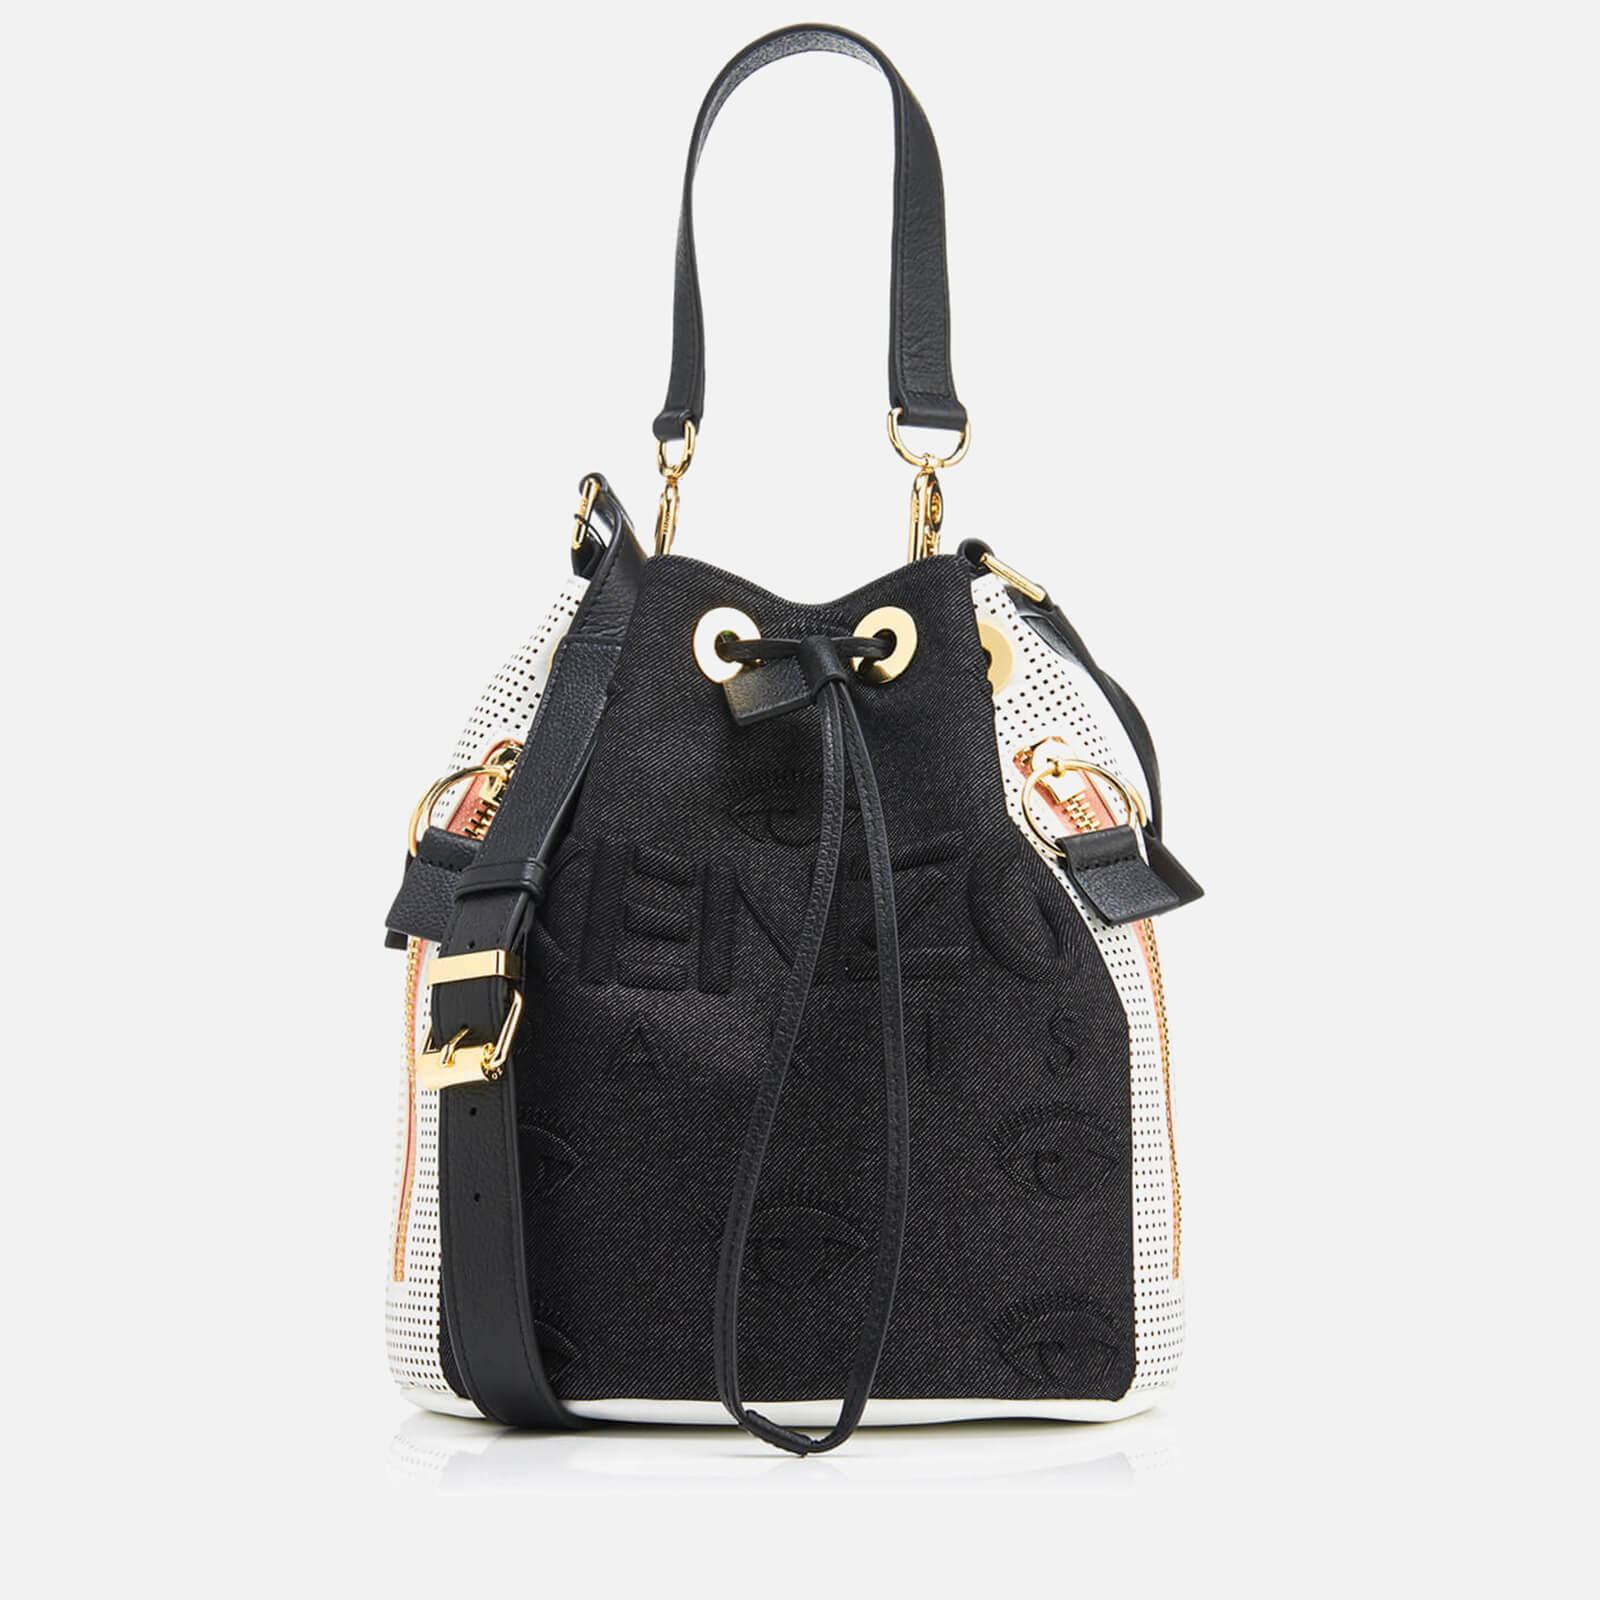 4e79cc178ec KENZO Women's Kombo Bucket Bag - Black - Free UK Delivery over £50